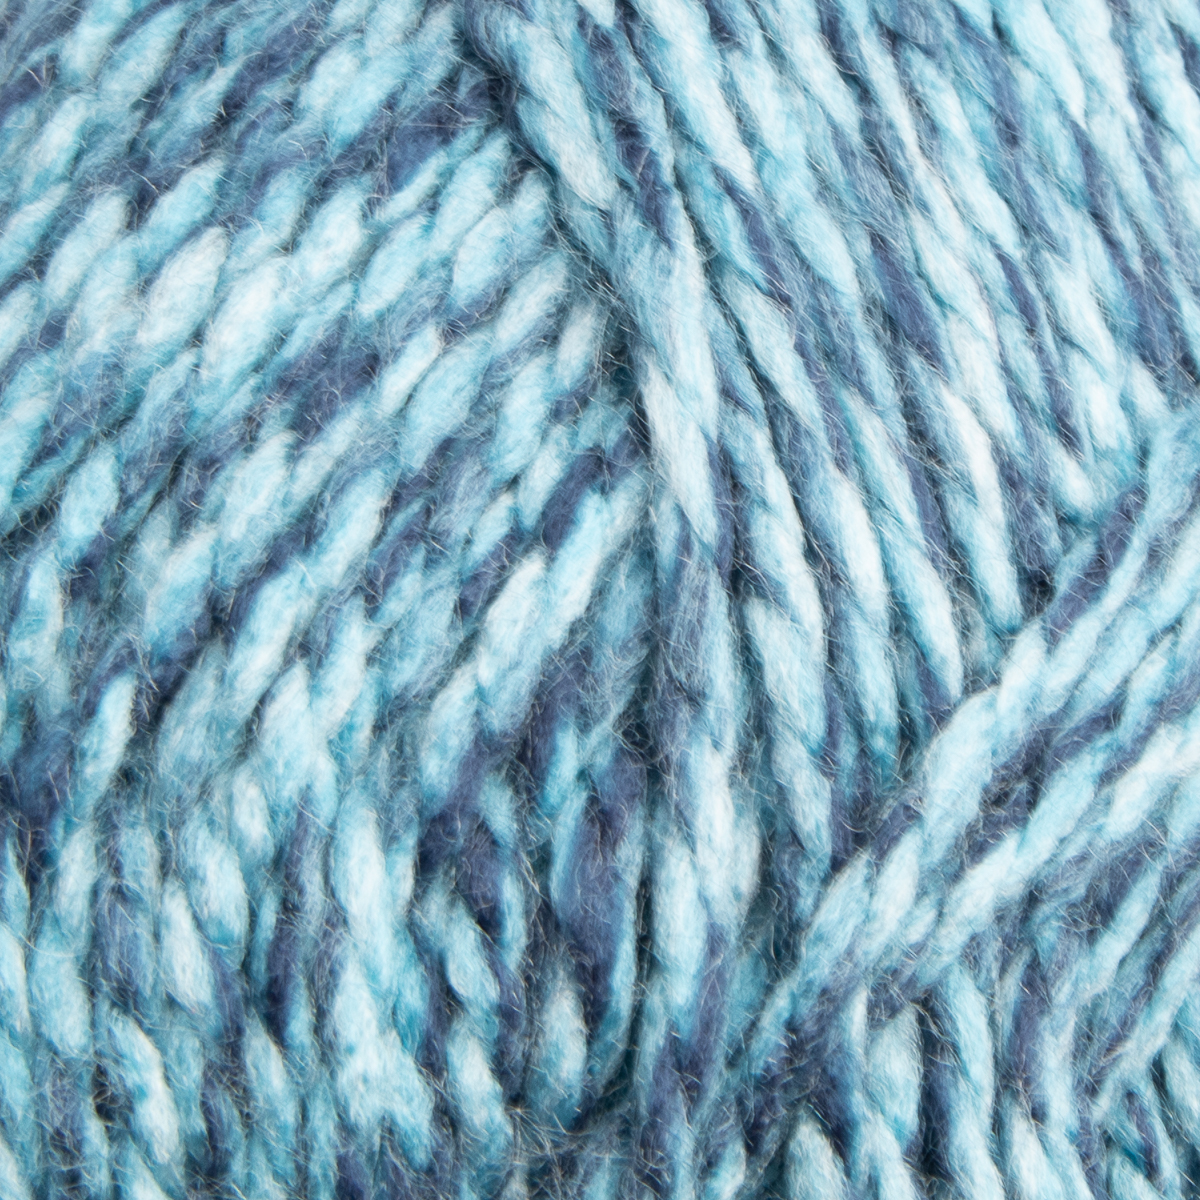 3pk-Premier-Yarns-Deborah-Norville-Serenity-100-Acrylic-Yarn-Chunky-5-Knitting thumbnail 90